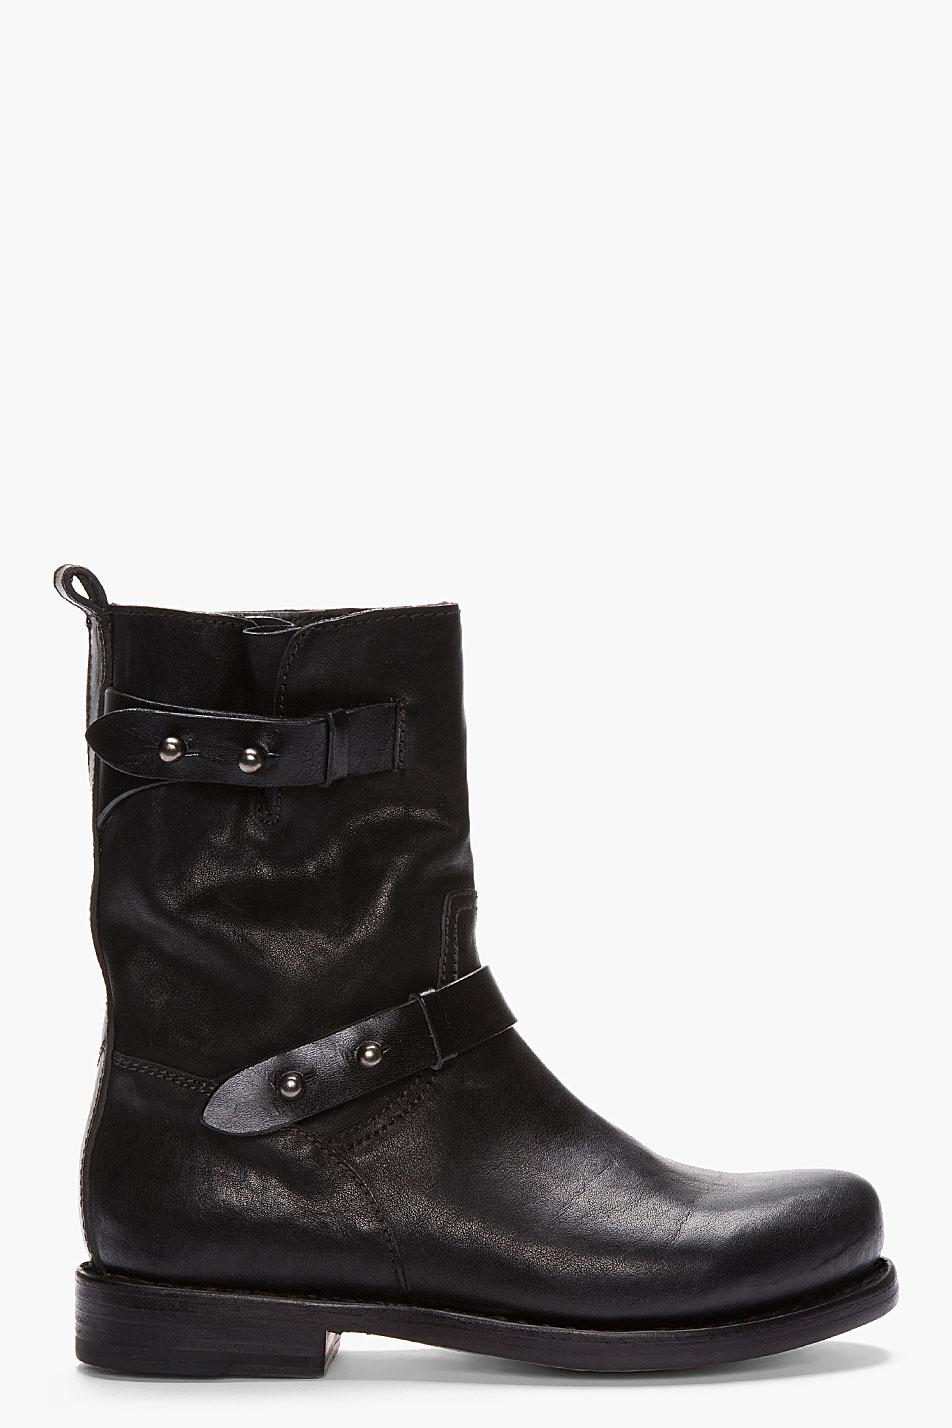 Rag Amp Bone Black Leather Moto Boots In Black Lyst